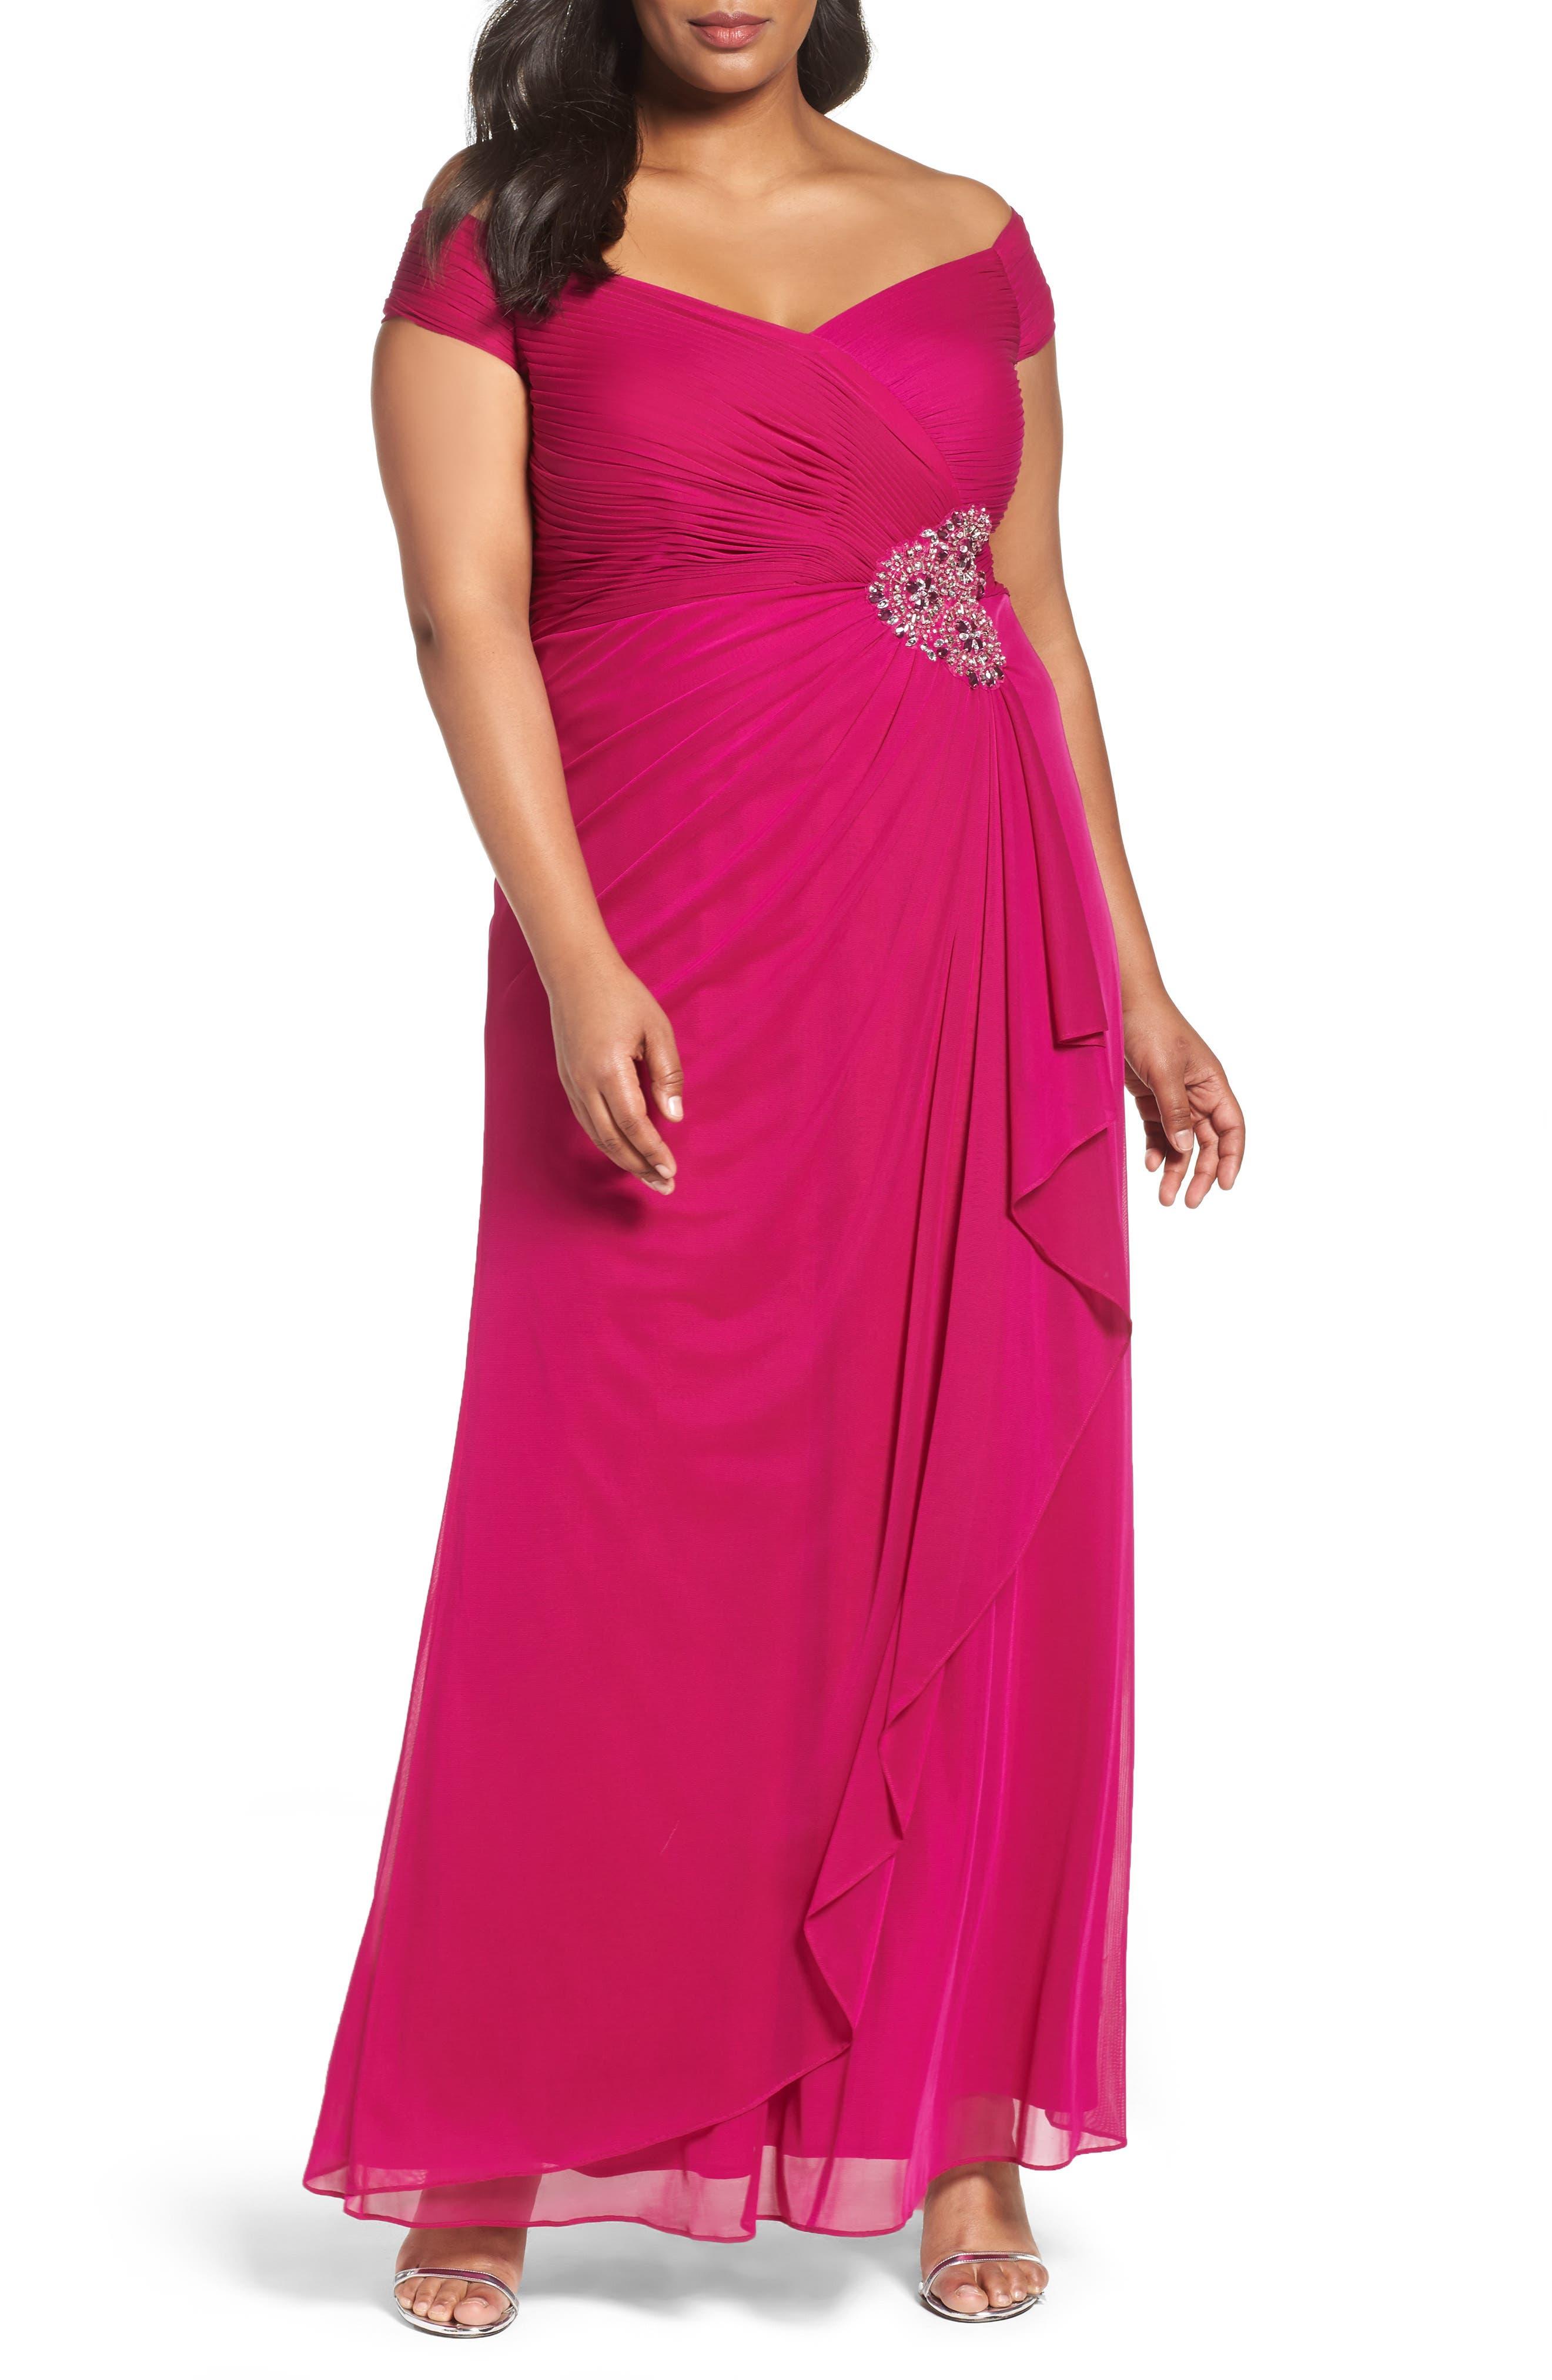 Alternate Image 1 Selected - Alex Evenings Embellished Off the Shoulder Gown (Plus Size)